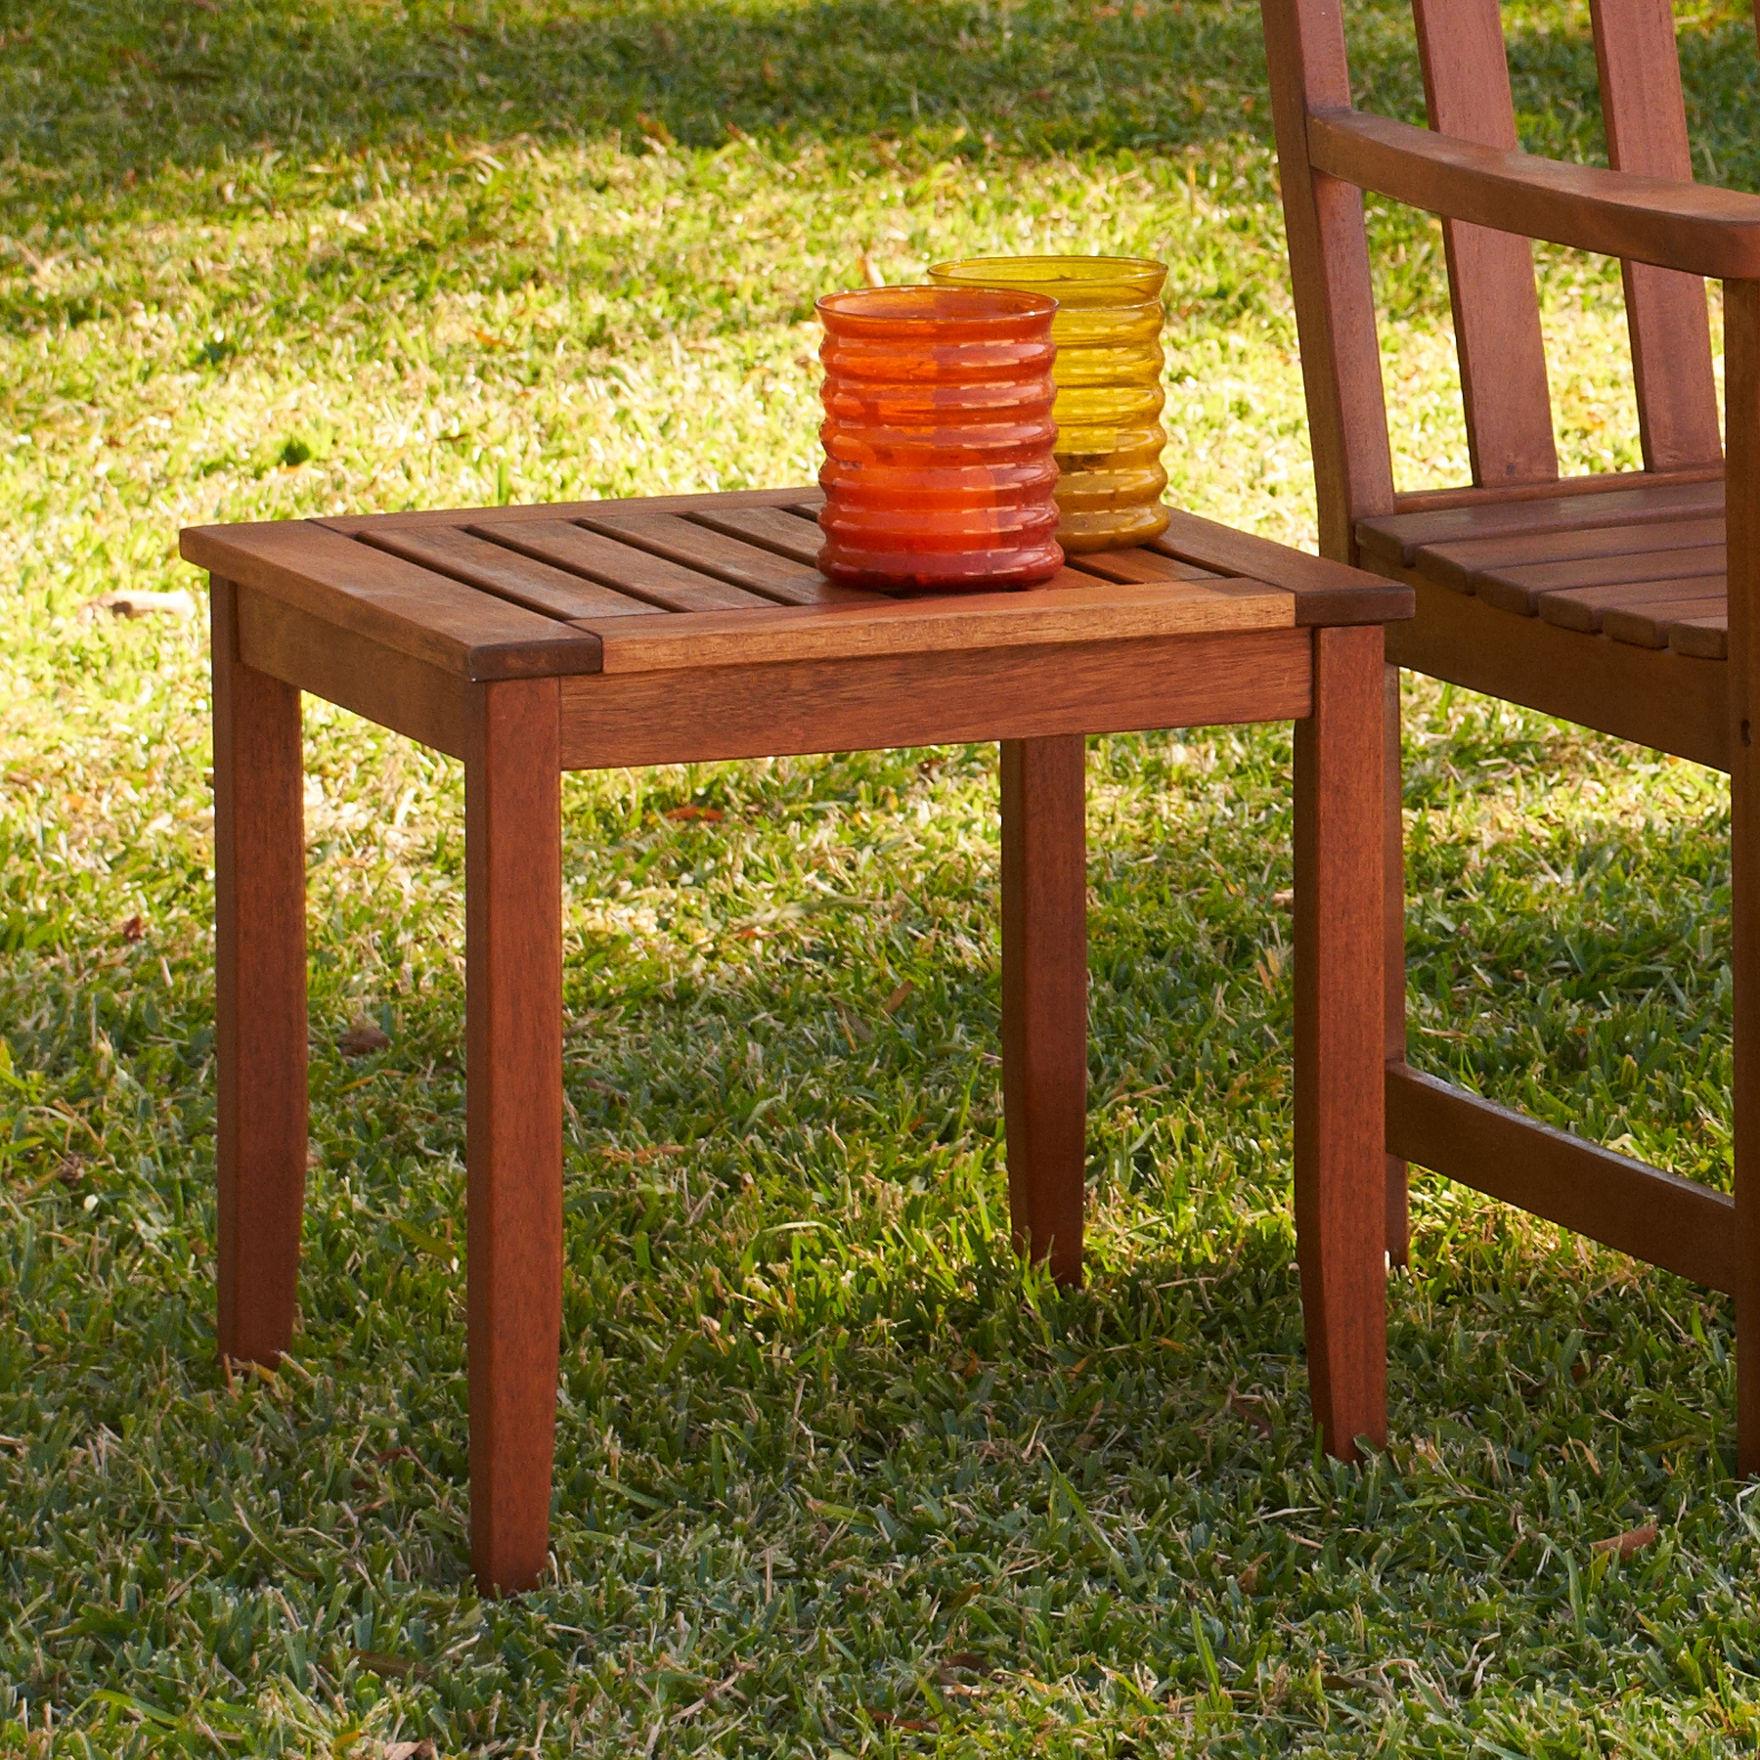 Southern Enterprises Brown Patio & Outdoor Furniture